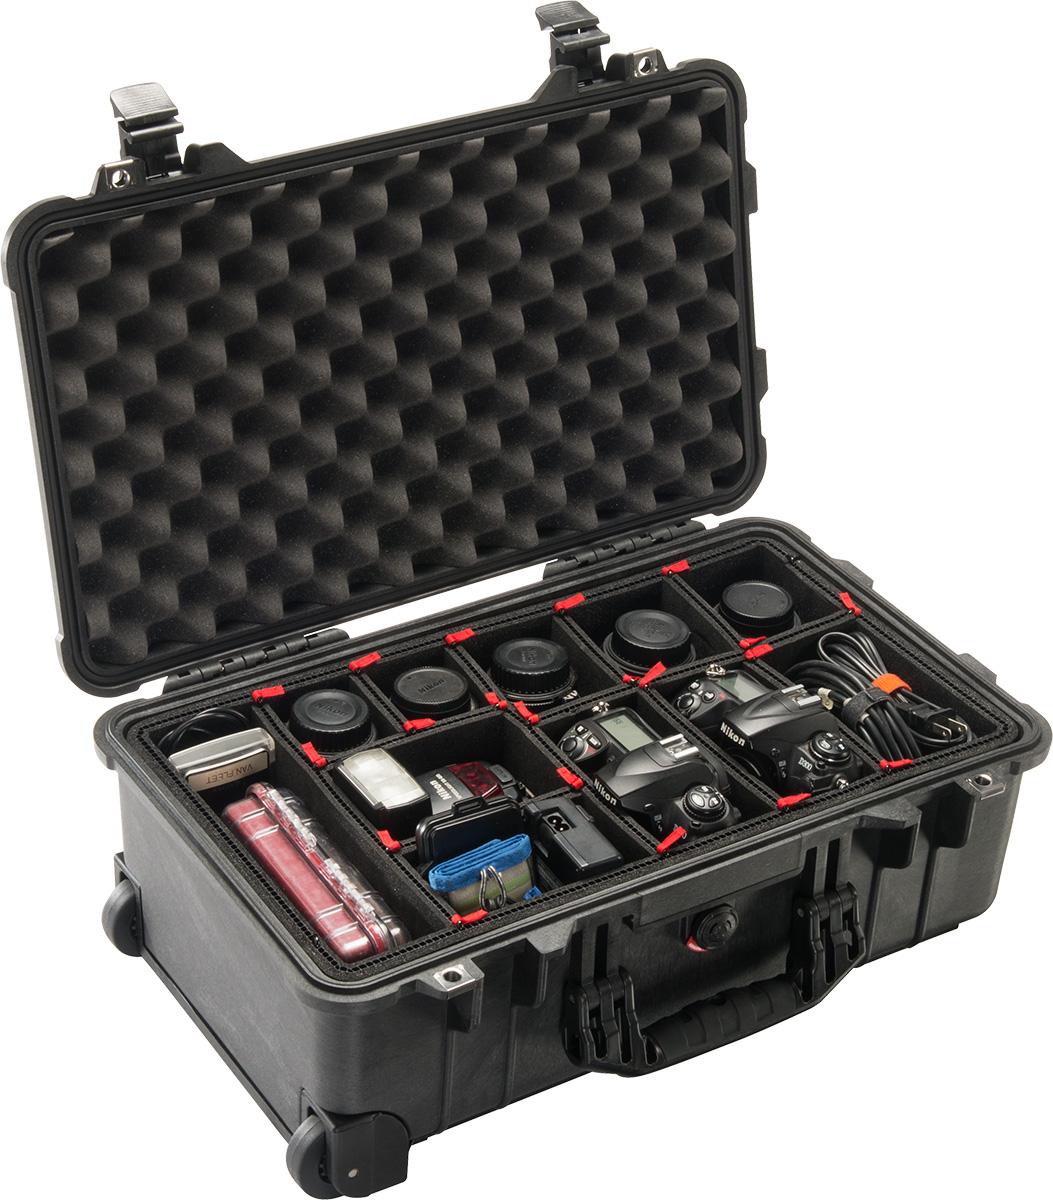 pelican camera cases 1510tp trekpak carry-on case